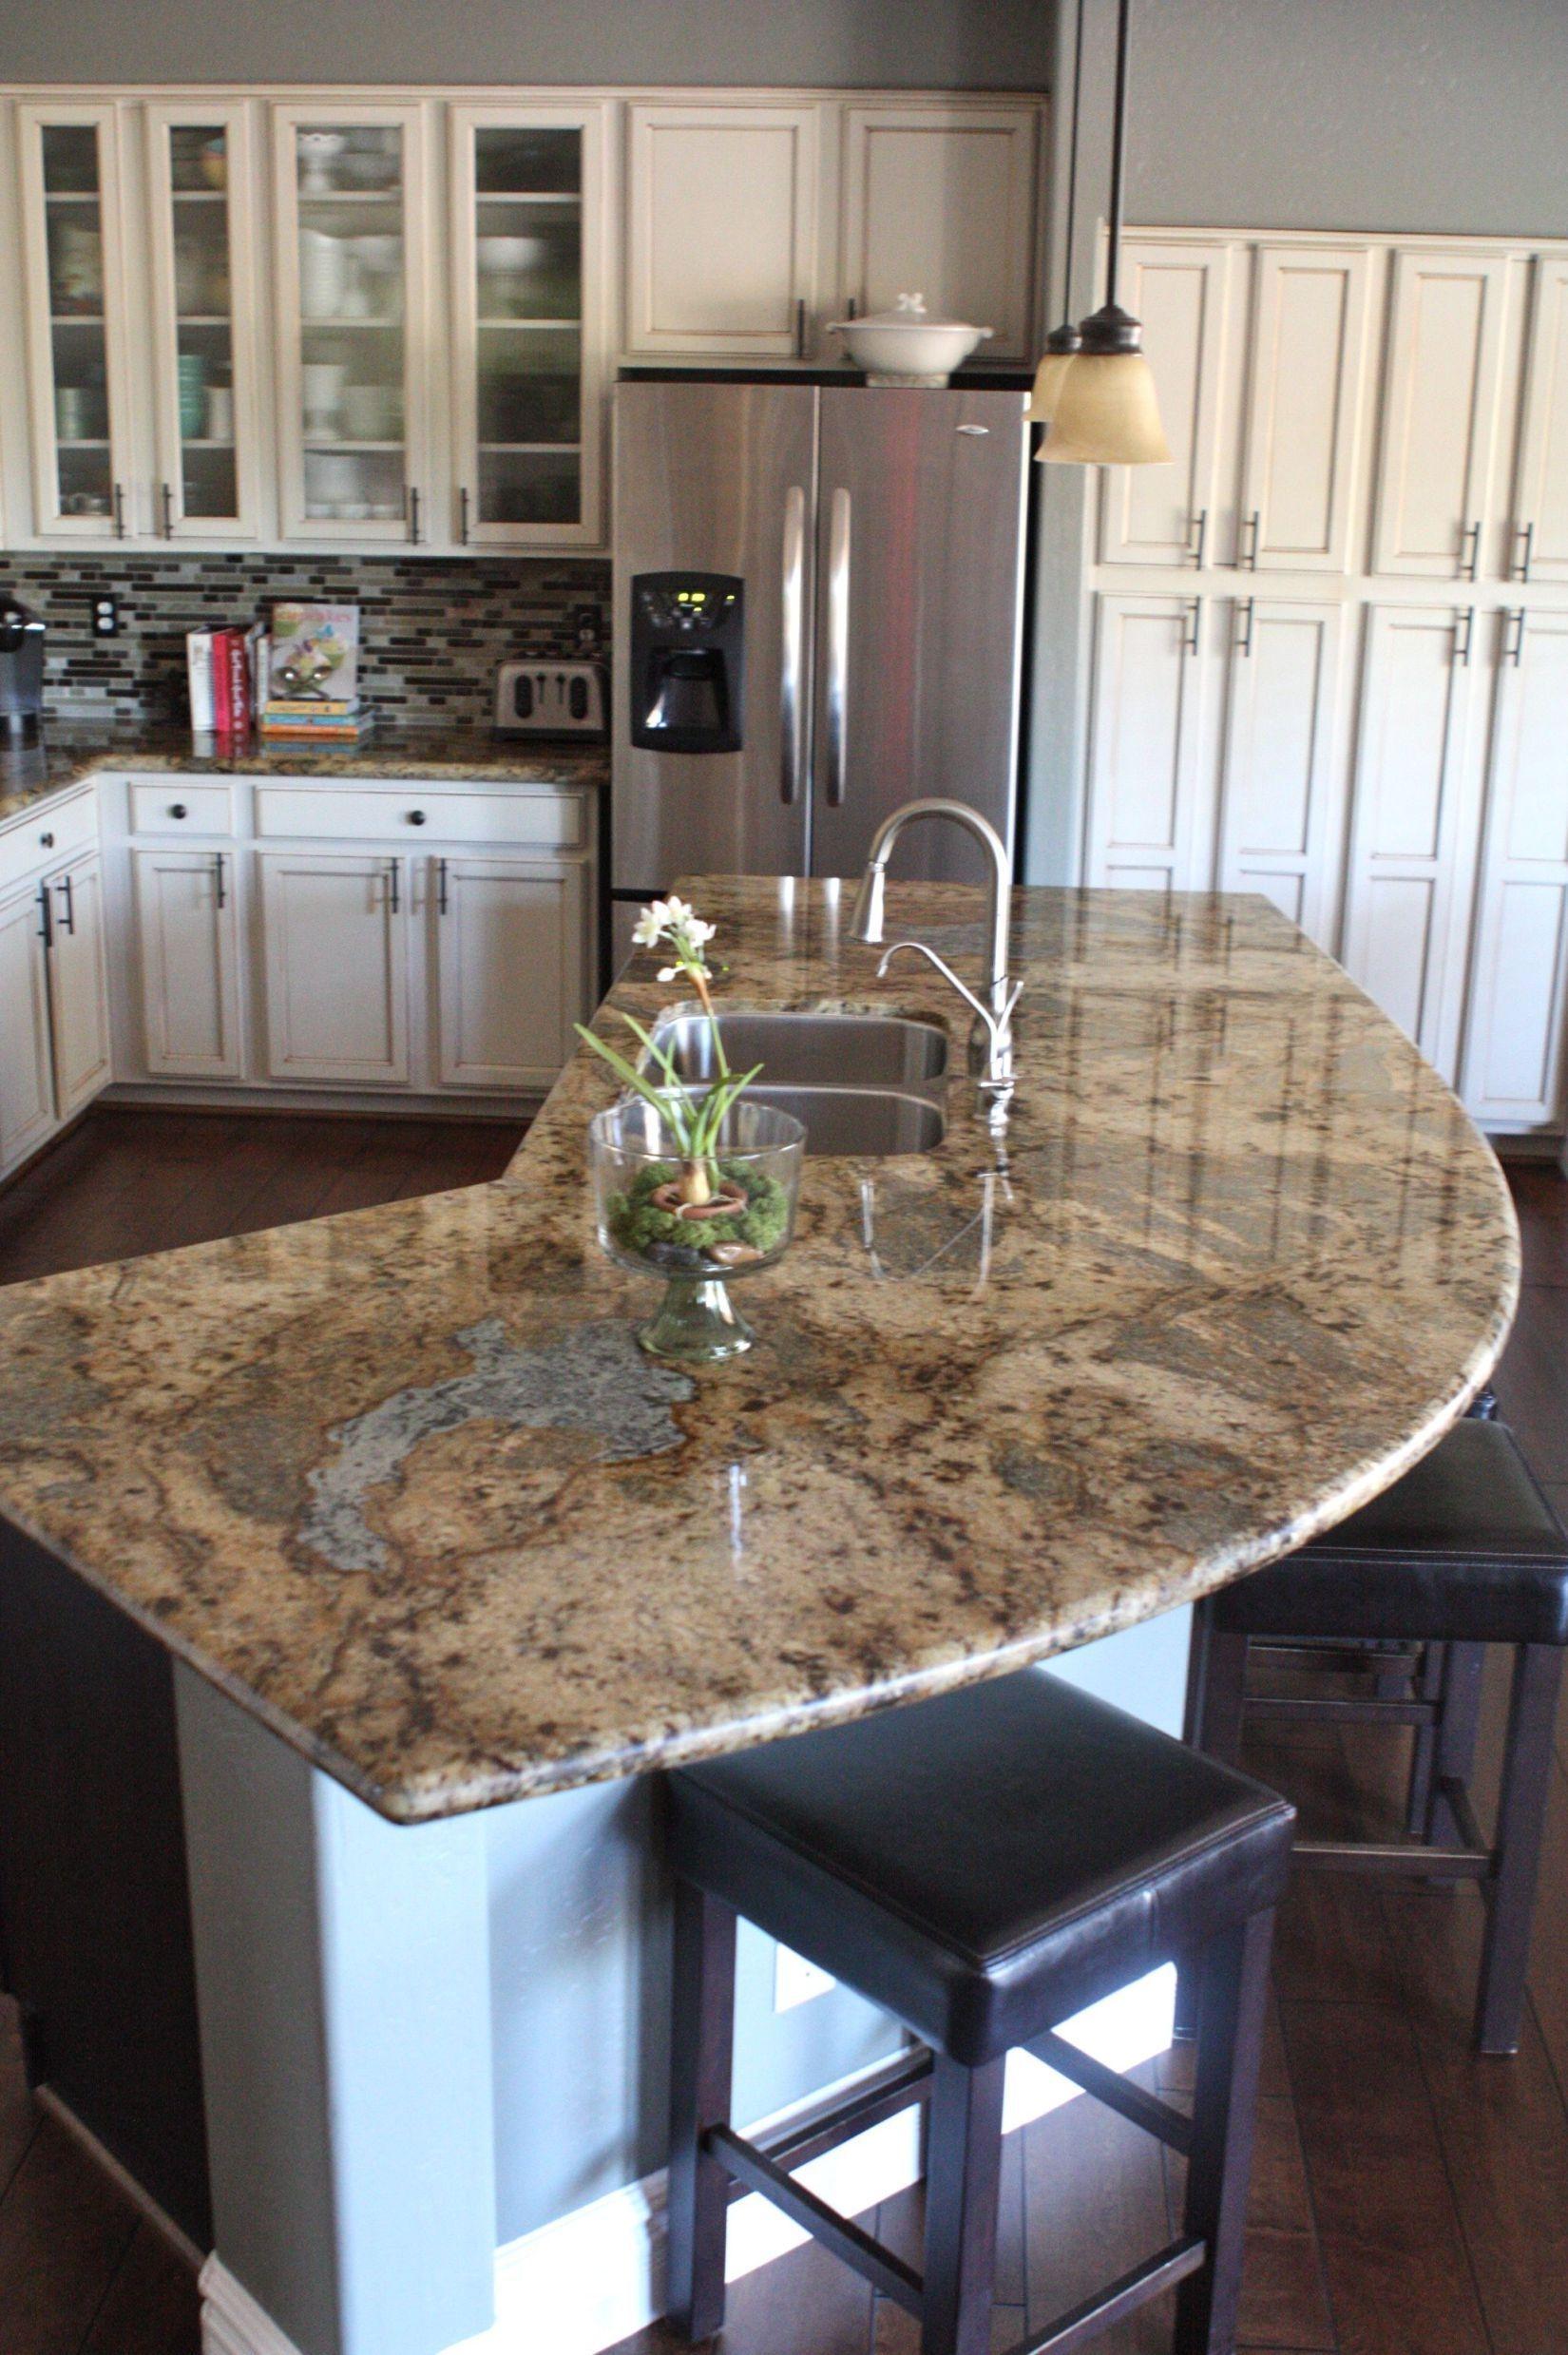 Admiring Granite Kitchen Countertops Ideas That You Shouldnt Miss11